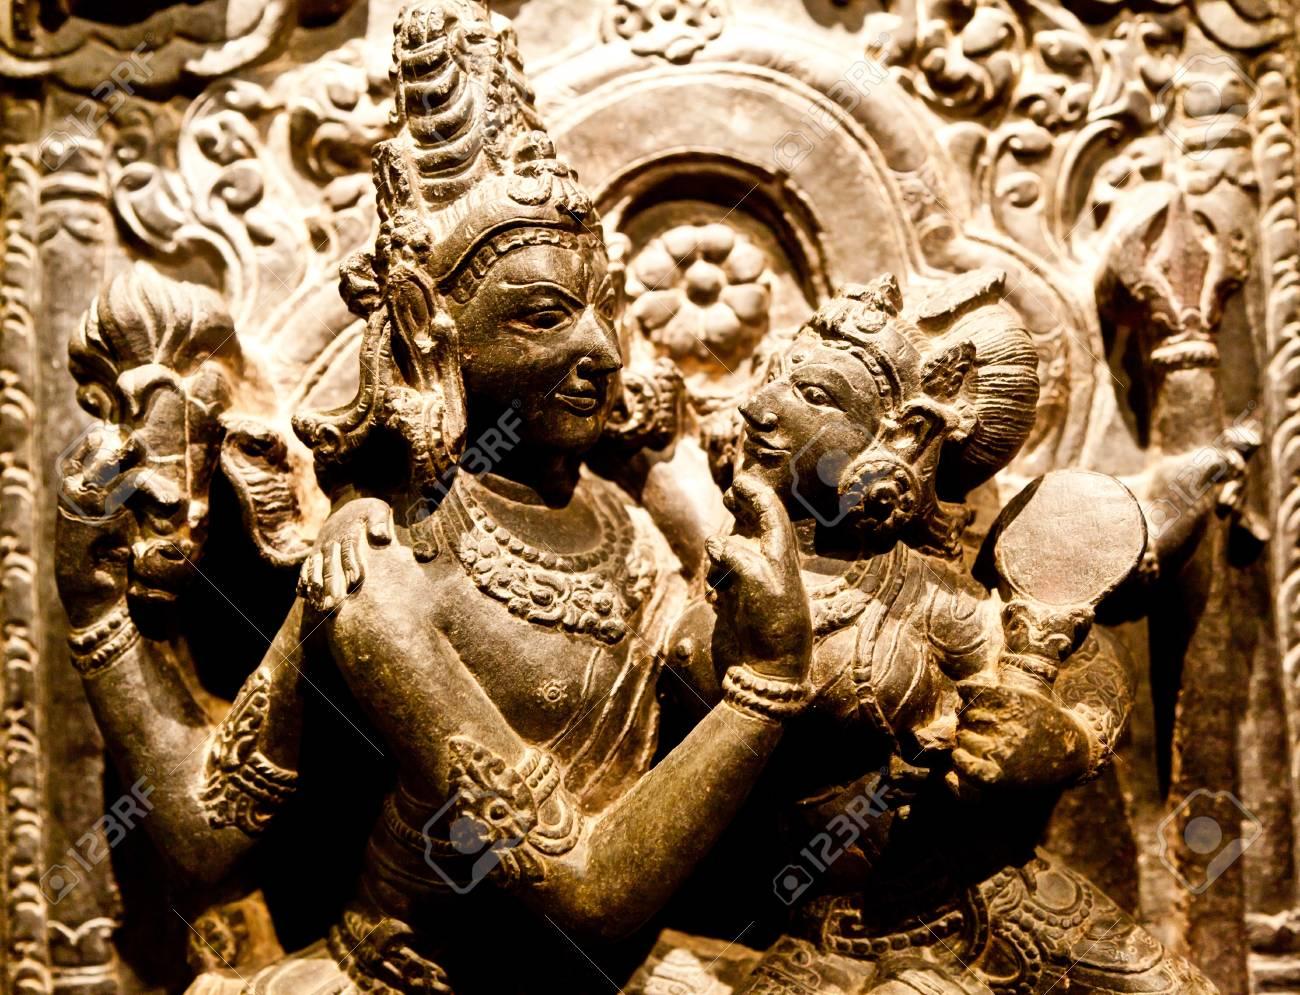 North-East India, X Century A.D., Basalt Stock Photo - 14407677